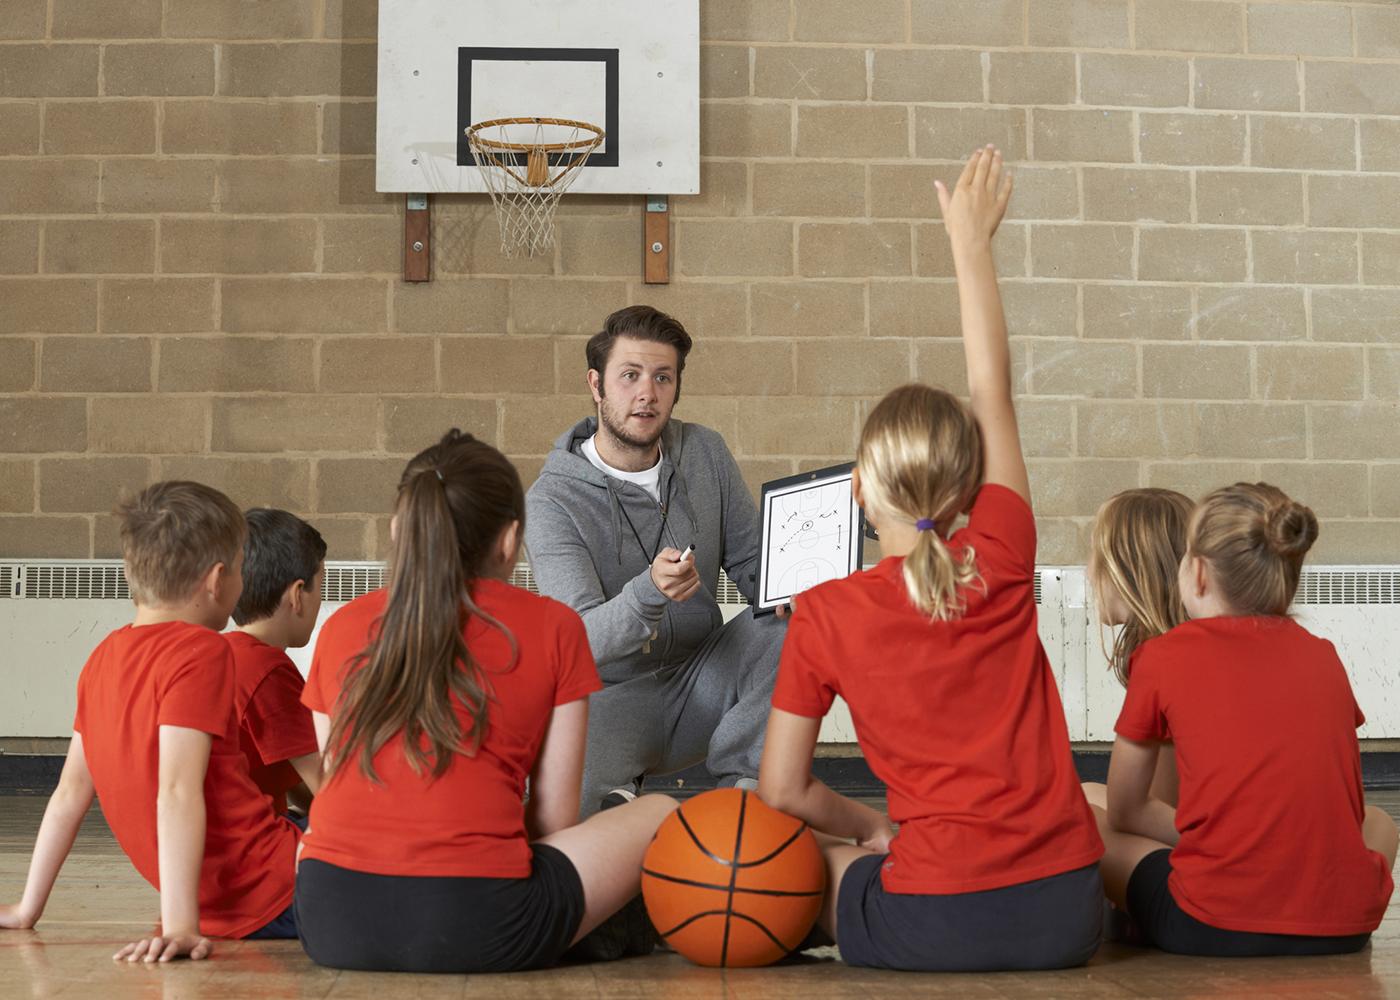 aula de desporto